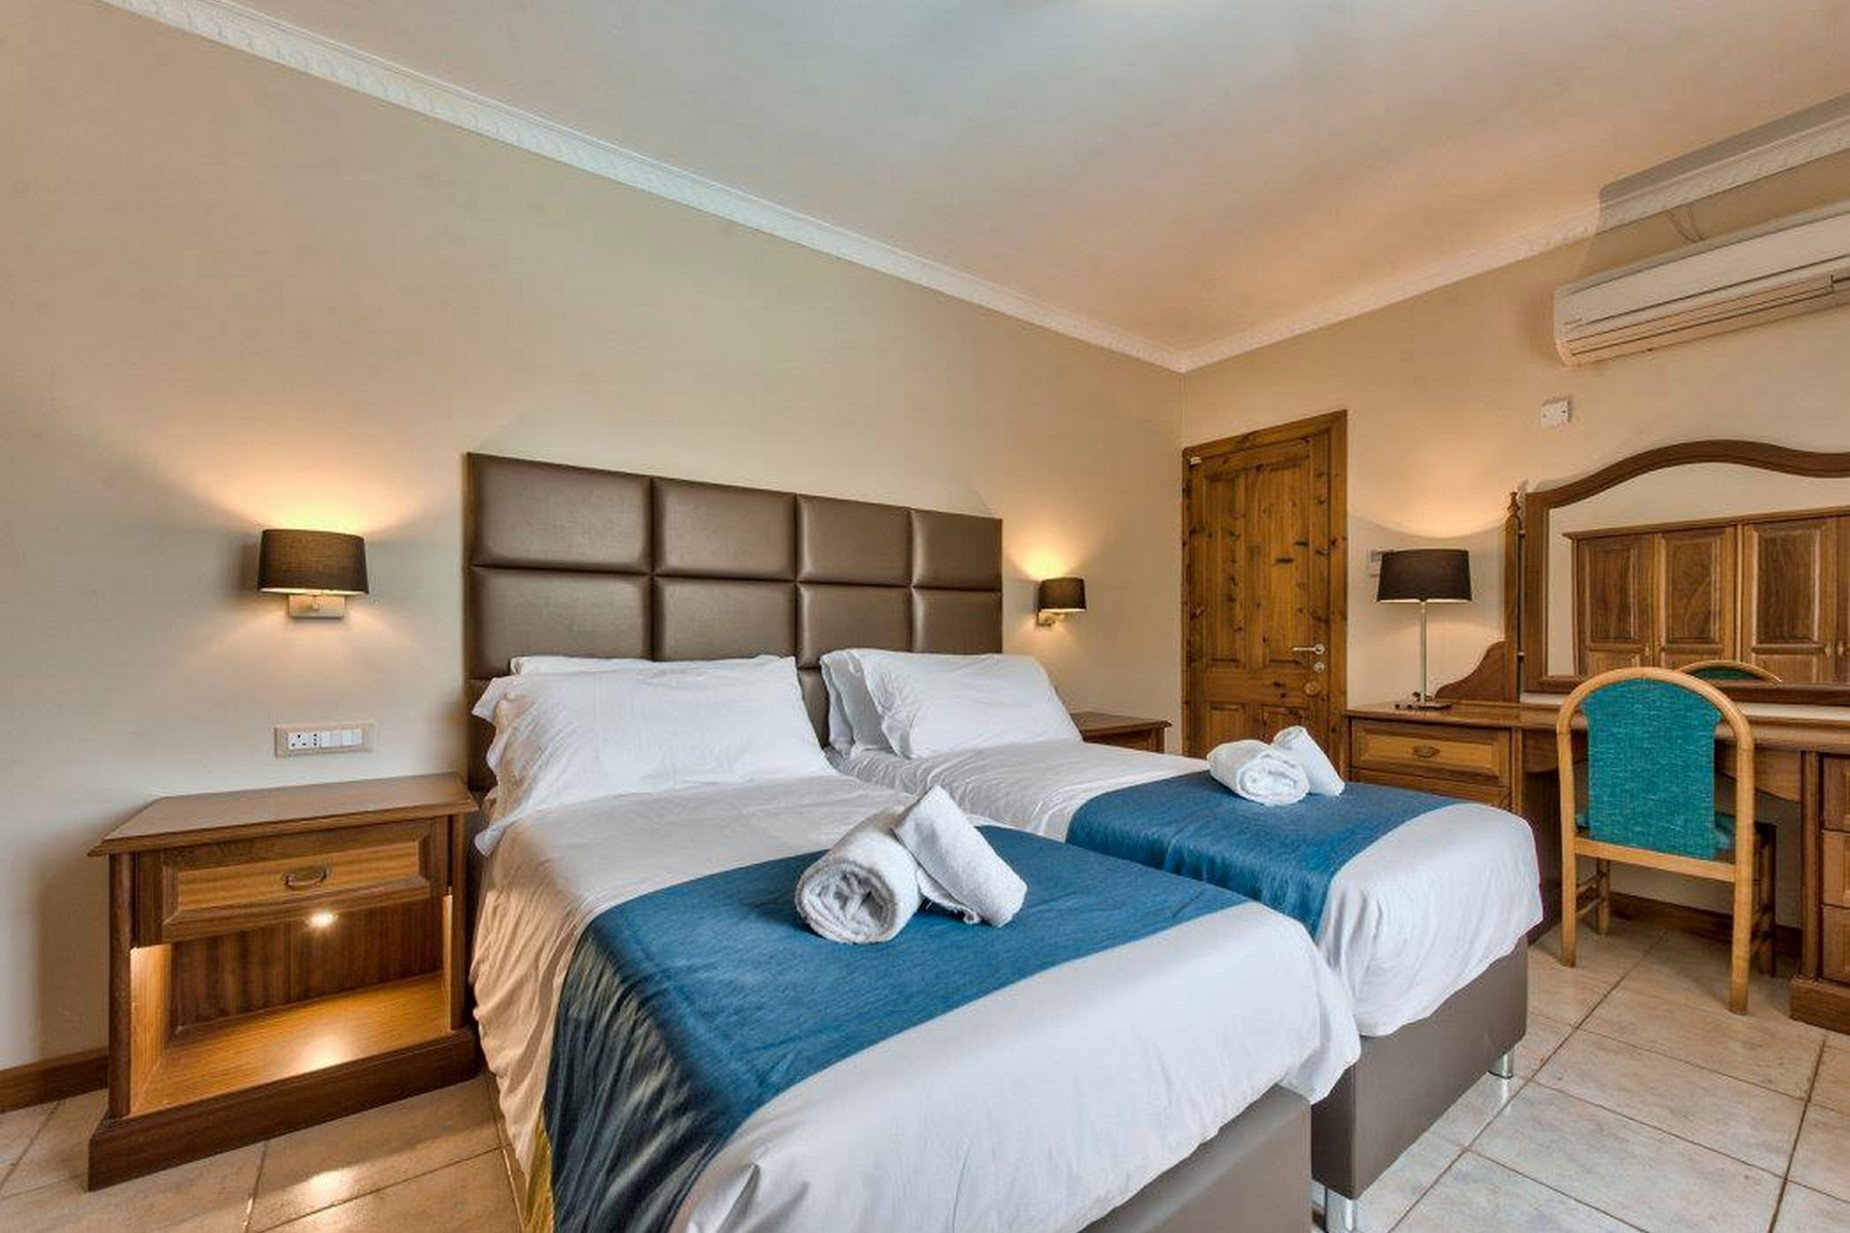 5 bed Villa For Rent in Mellieha, Mellieha - thumb 9